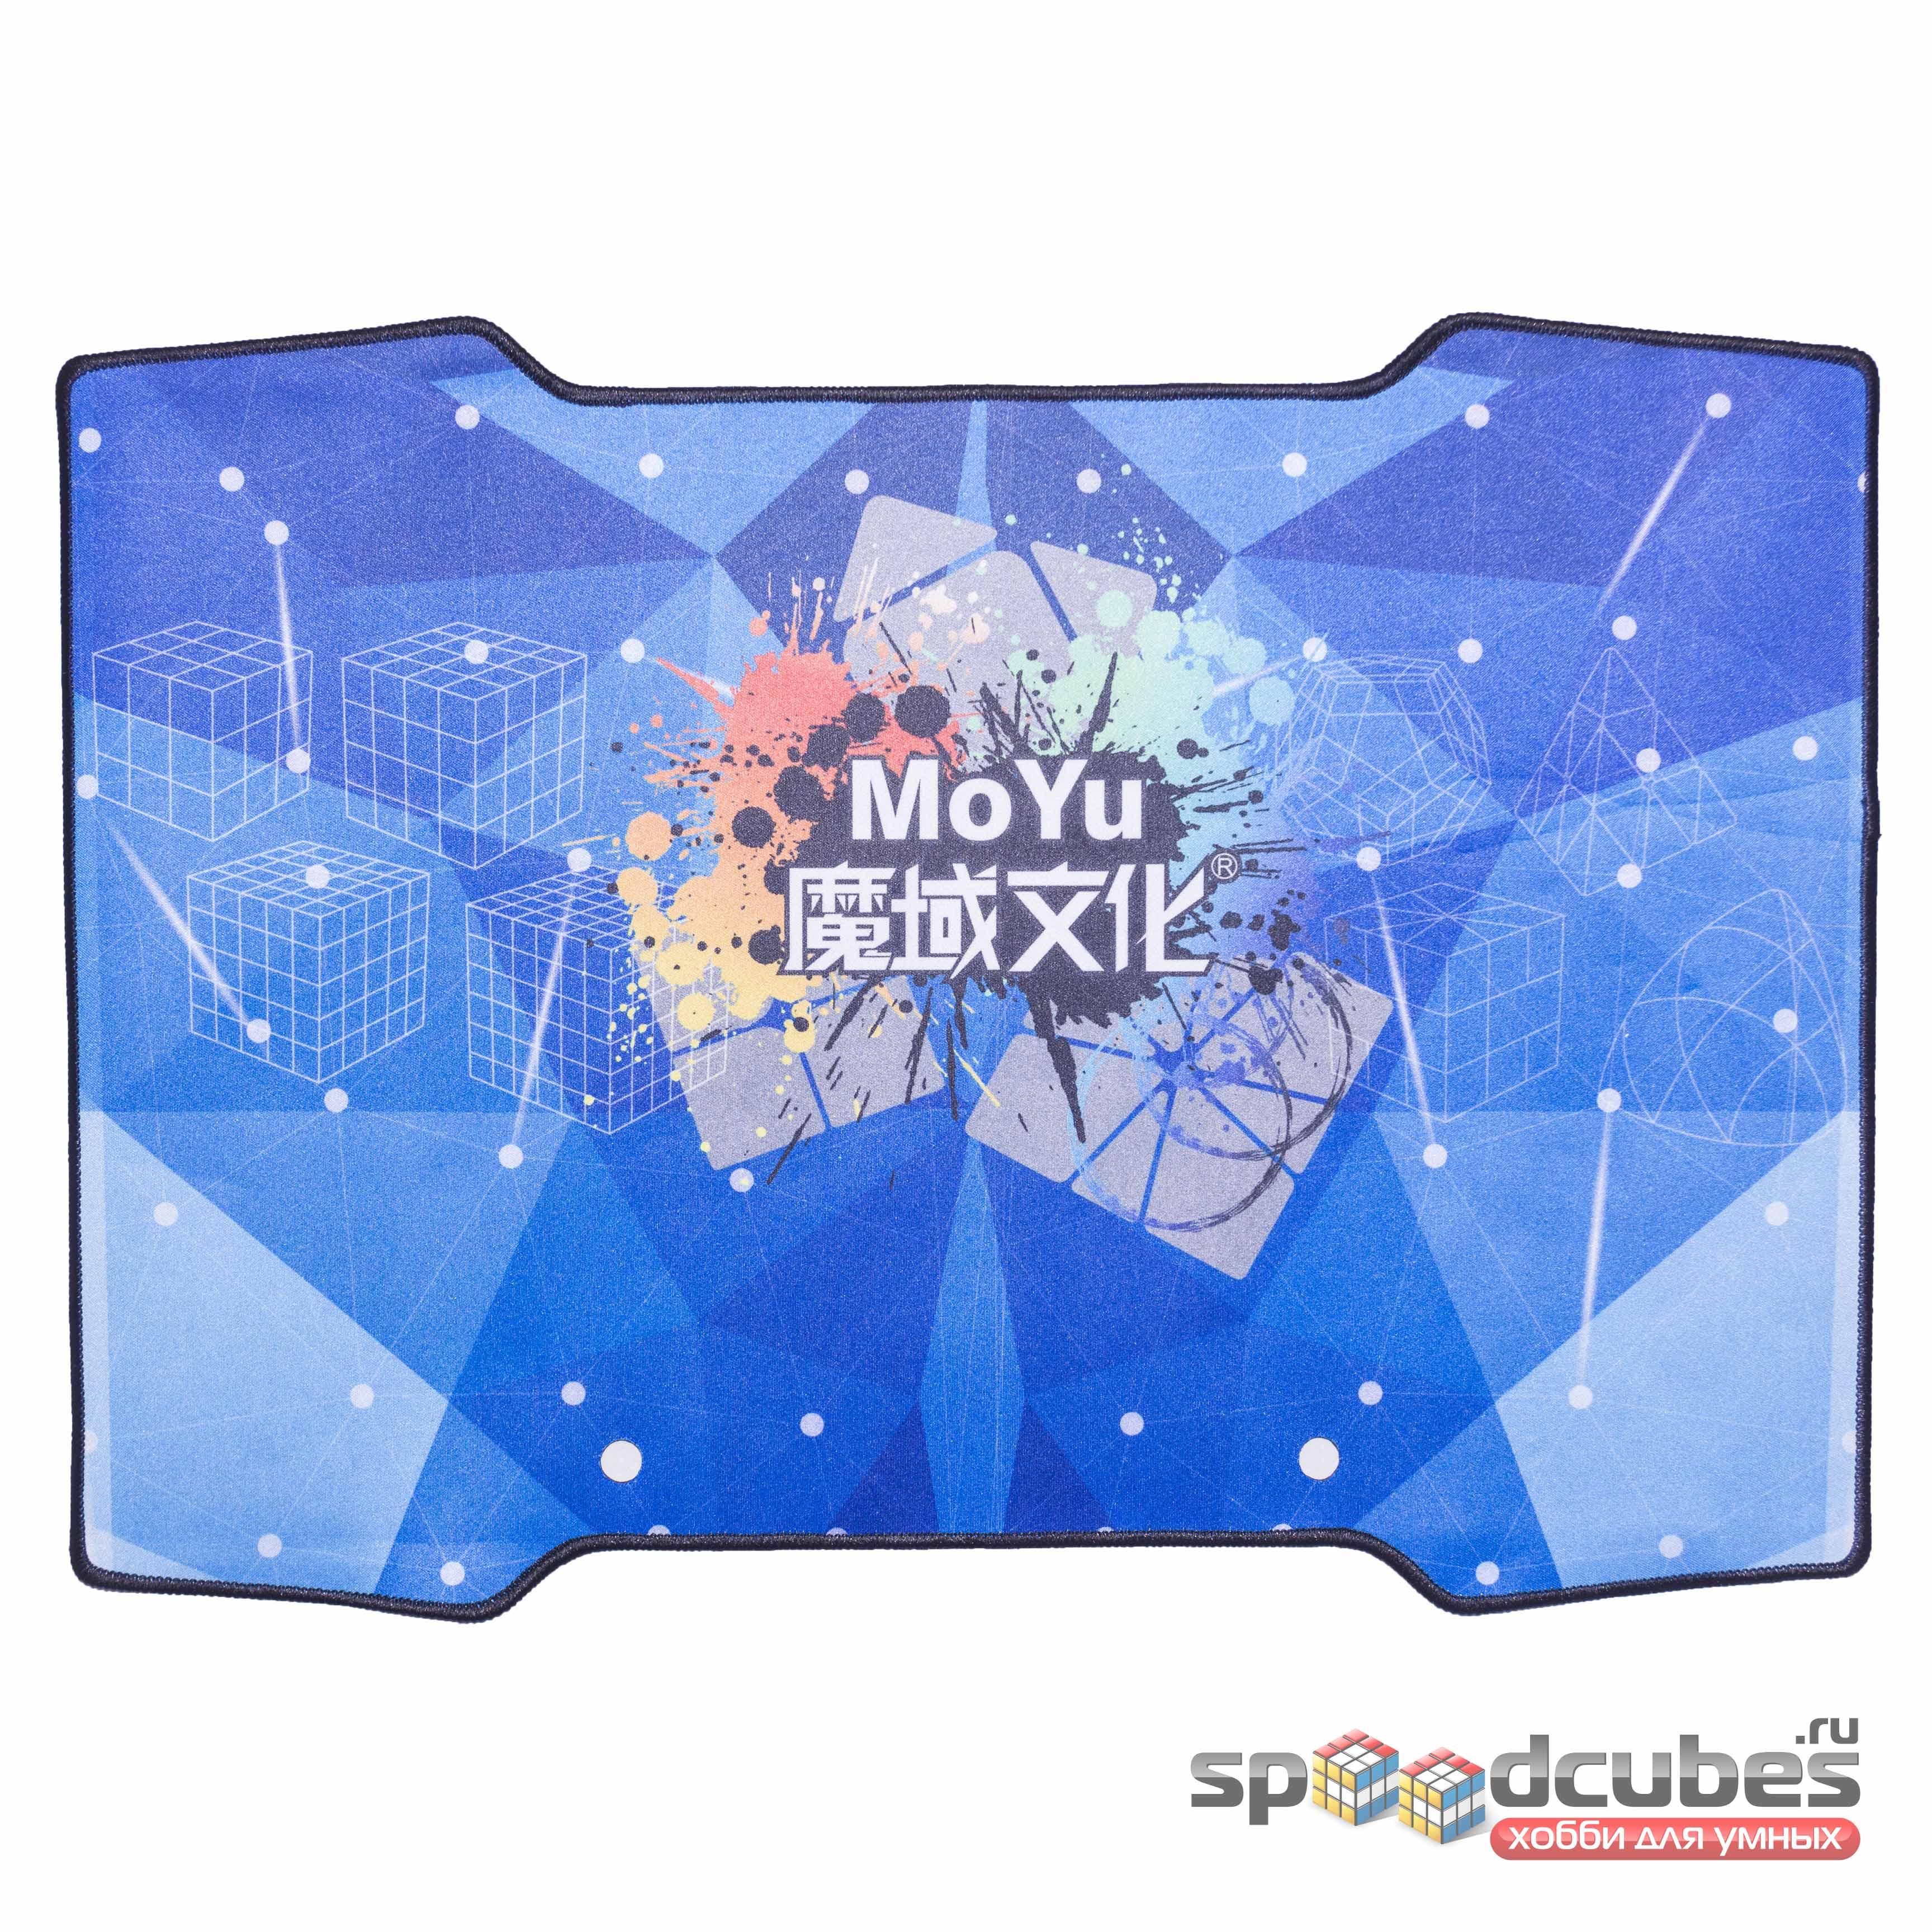 Moyu Cube Mat для спидкубинга 1